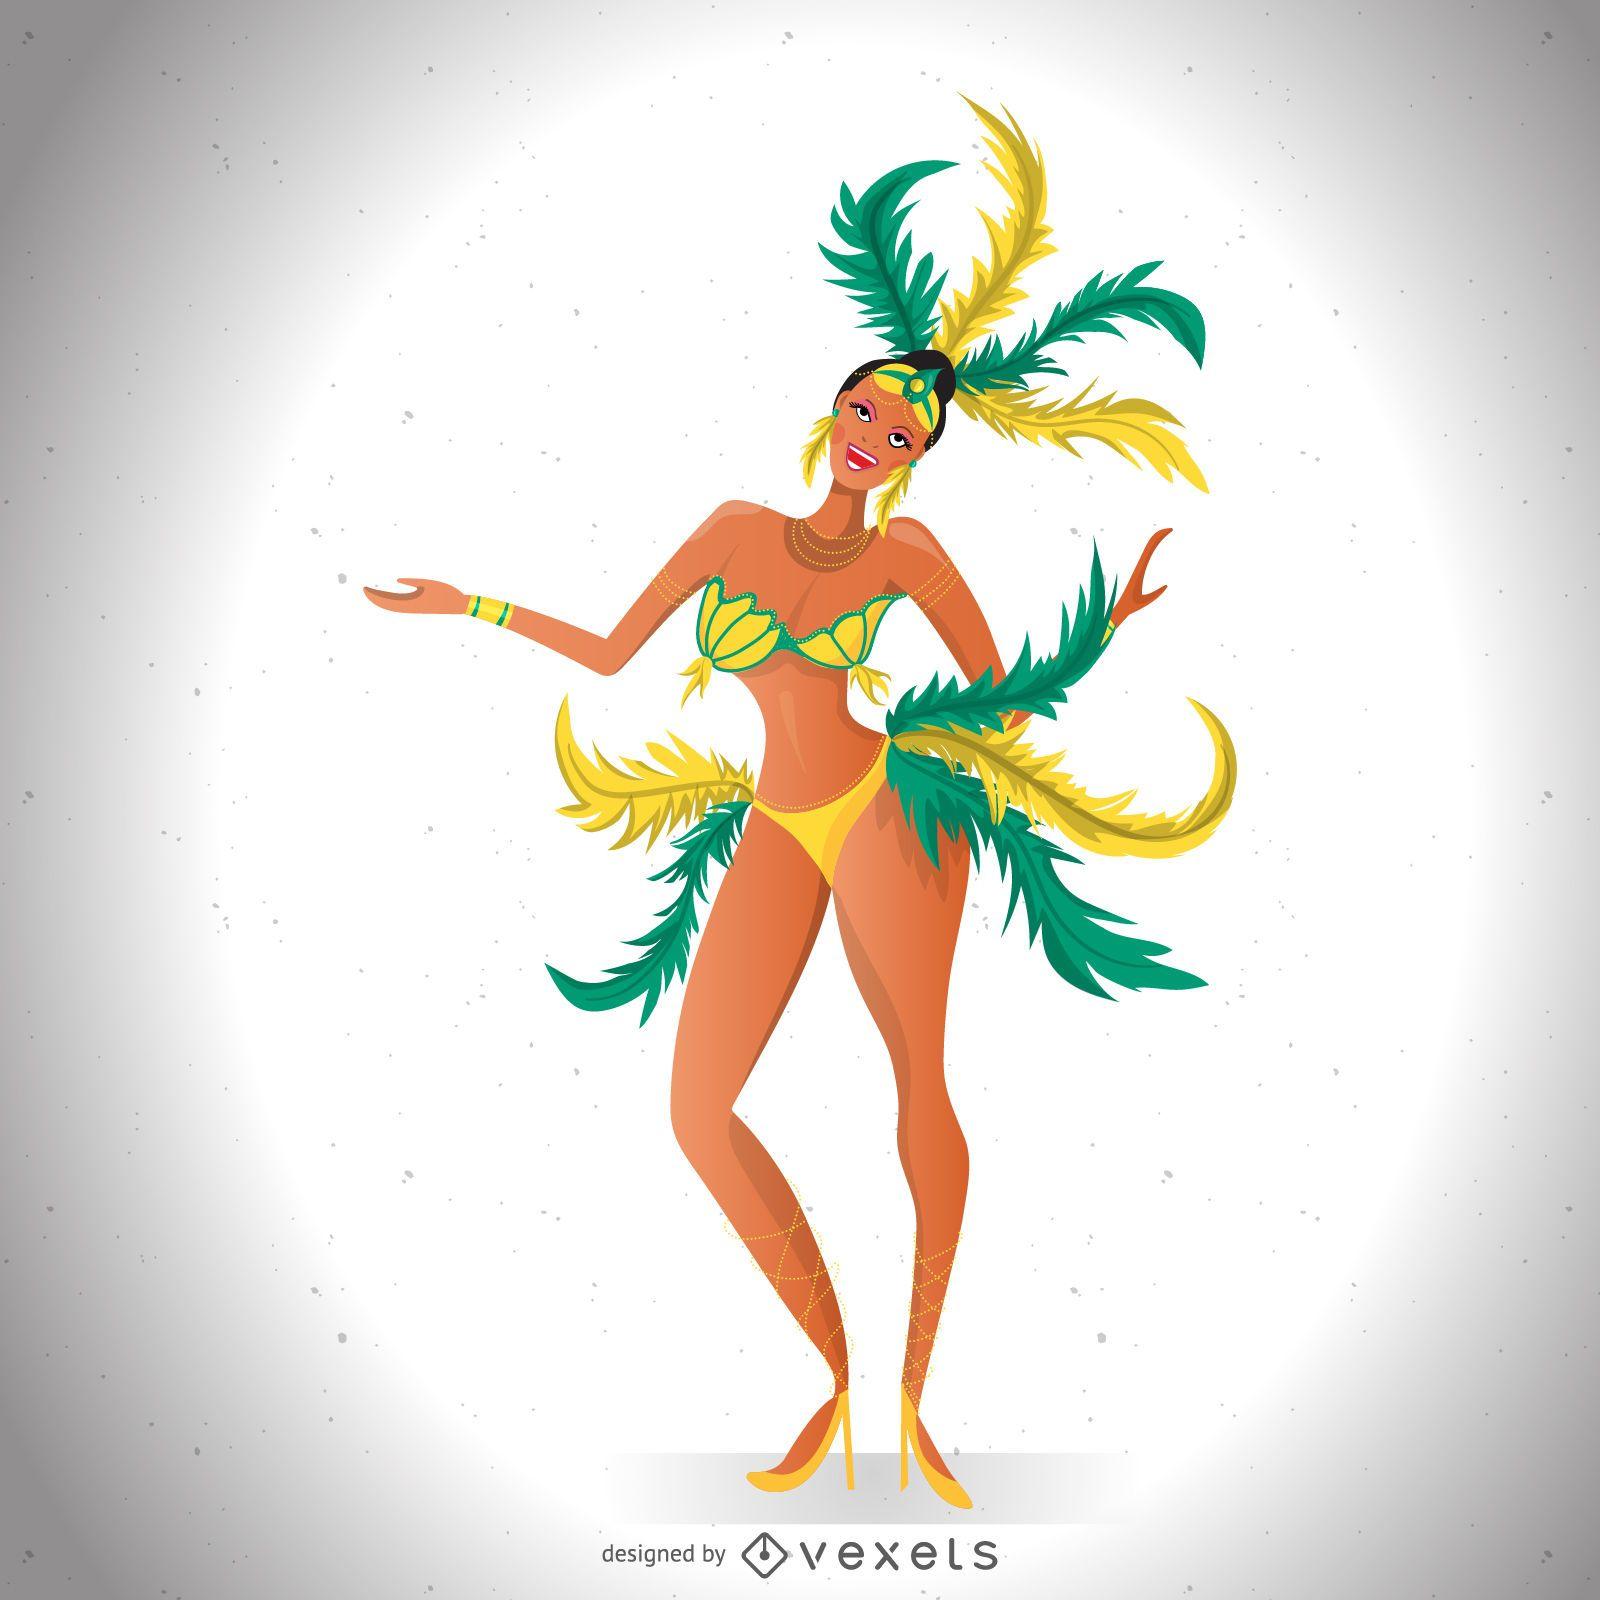 Brasilian carnival dancer illustration